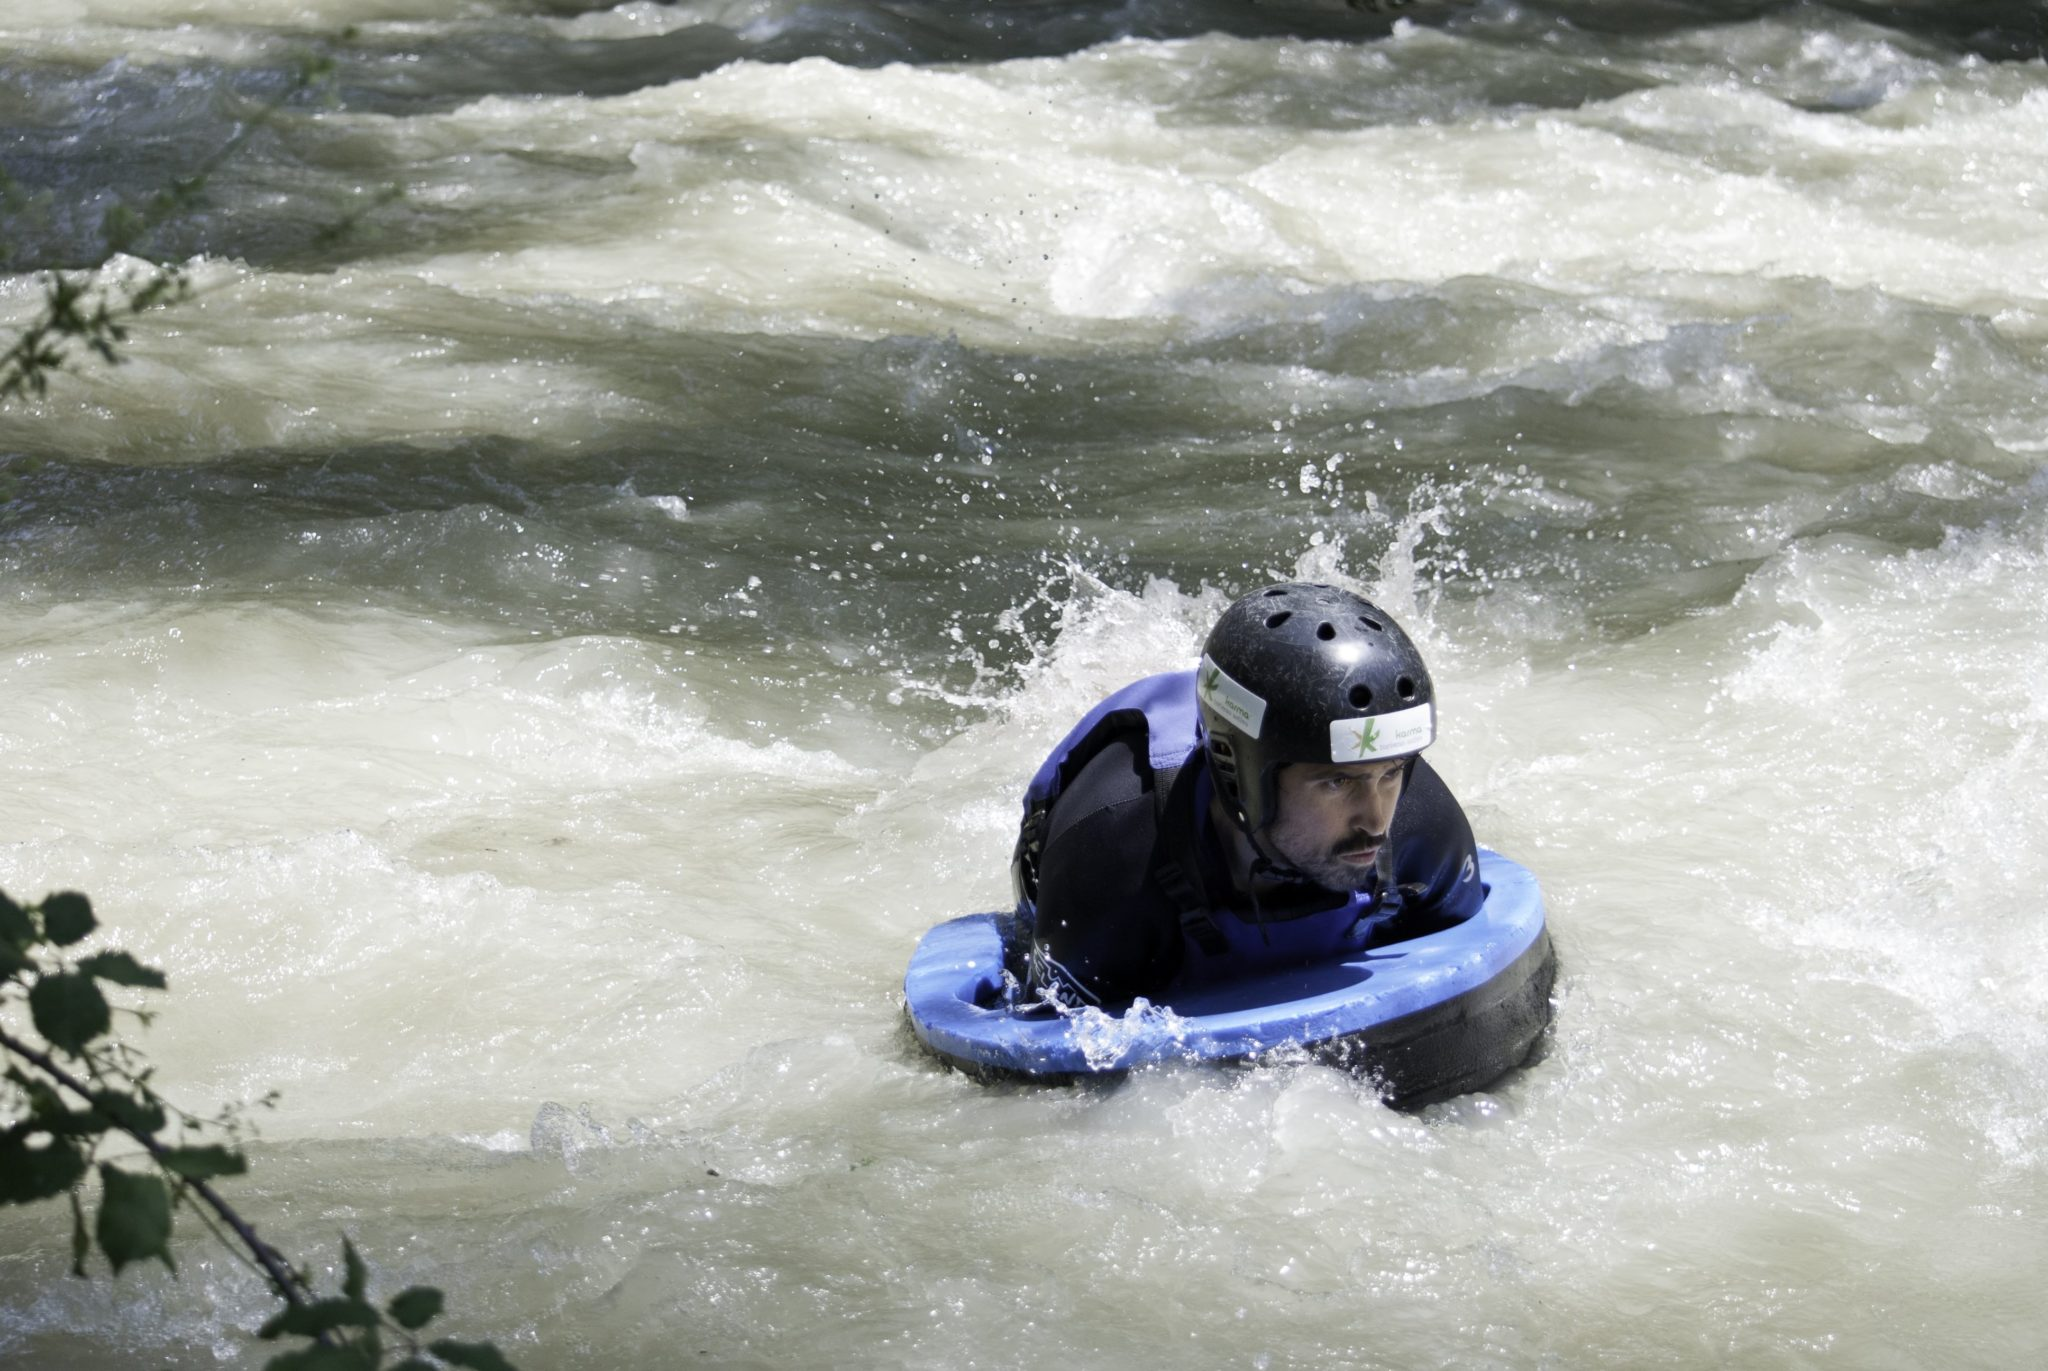 persona realizando hidrospeed